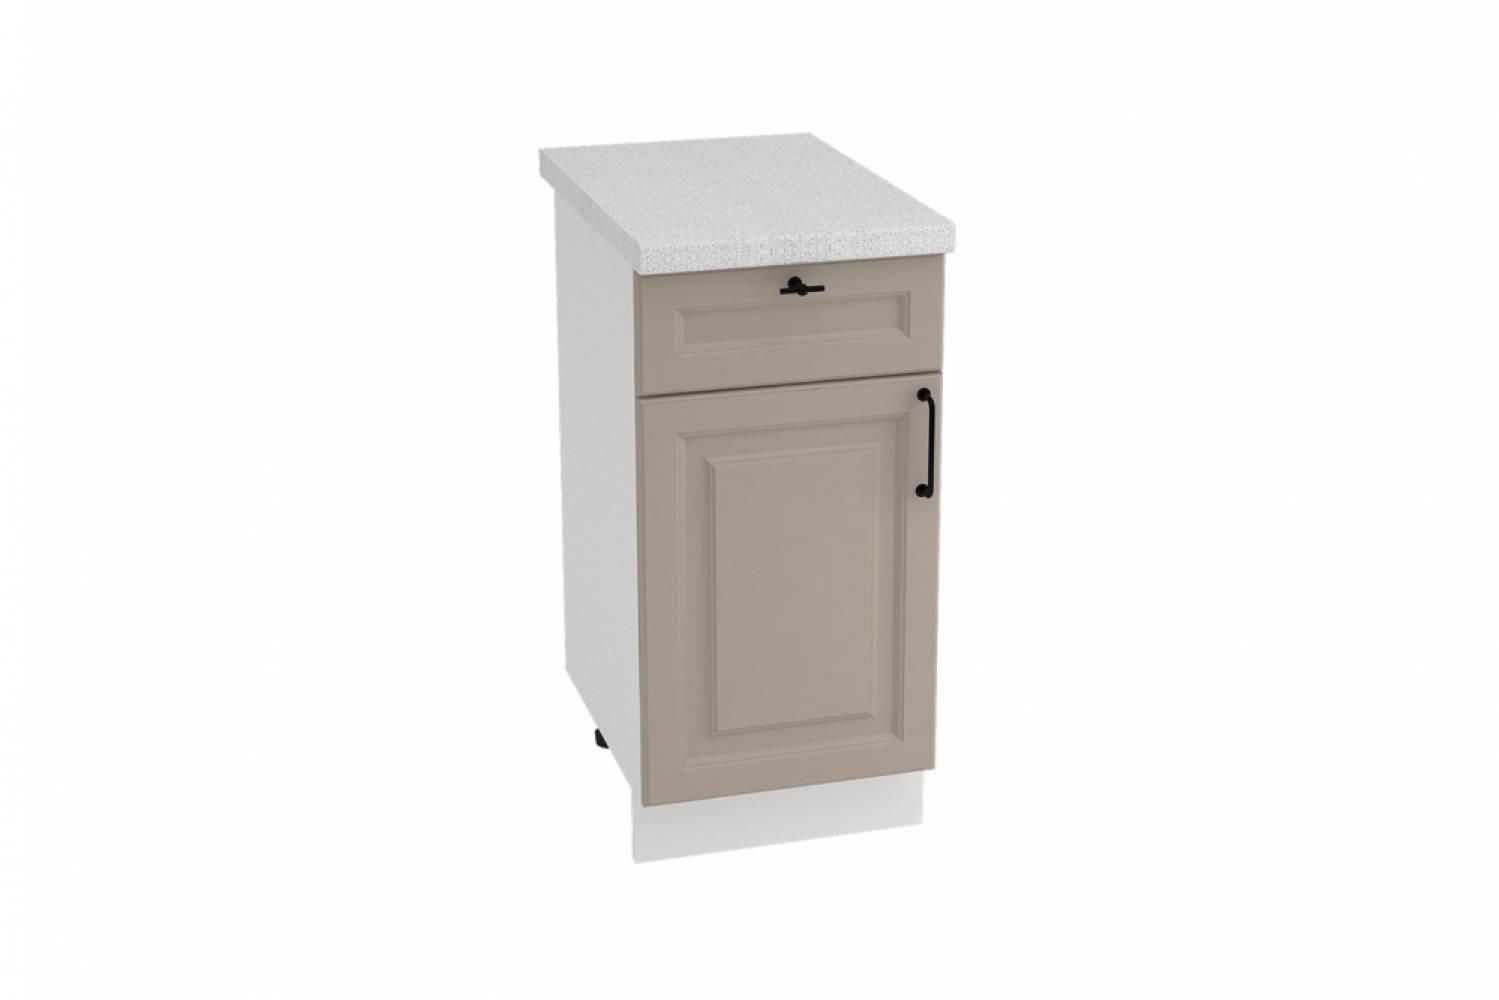 Шкаф нижний с 1 ящиком ШН1Я 400 НИЦЦА ROYAL (OMNIA) 400 мм